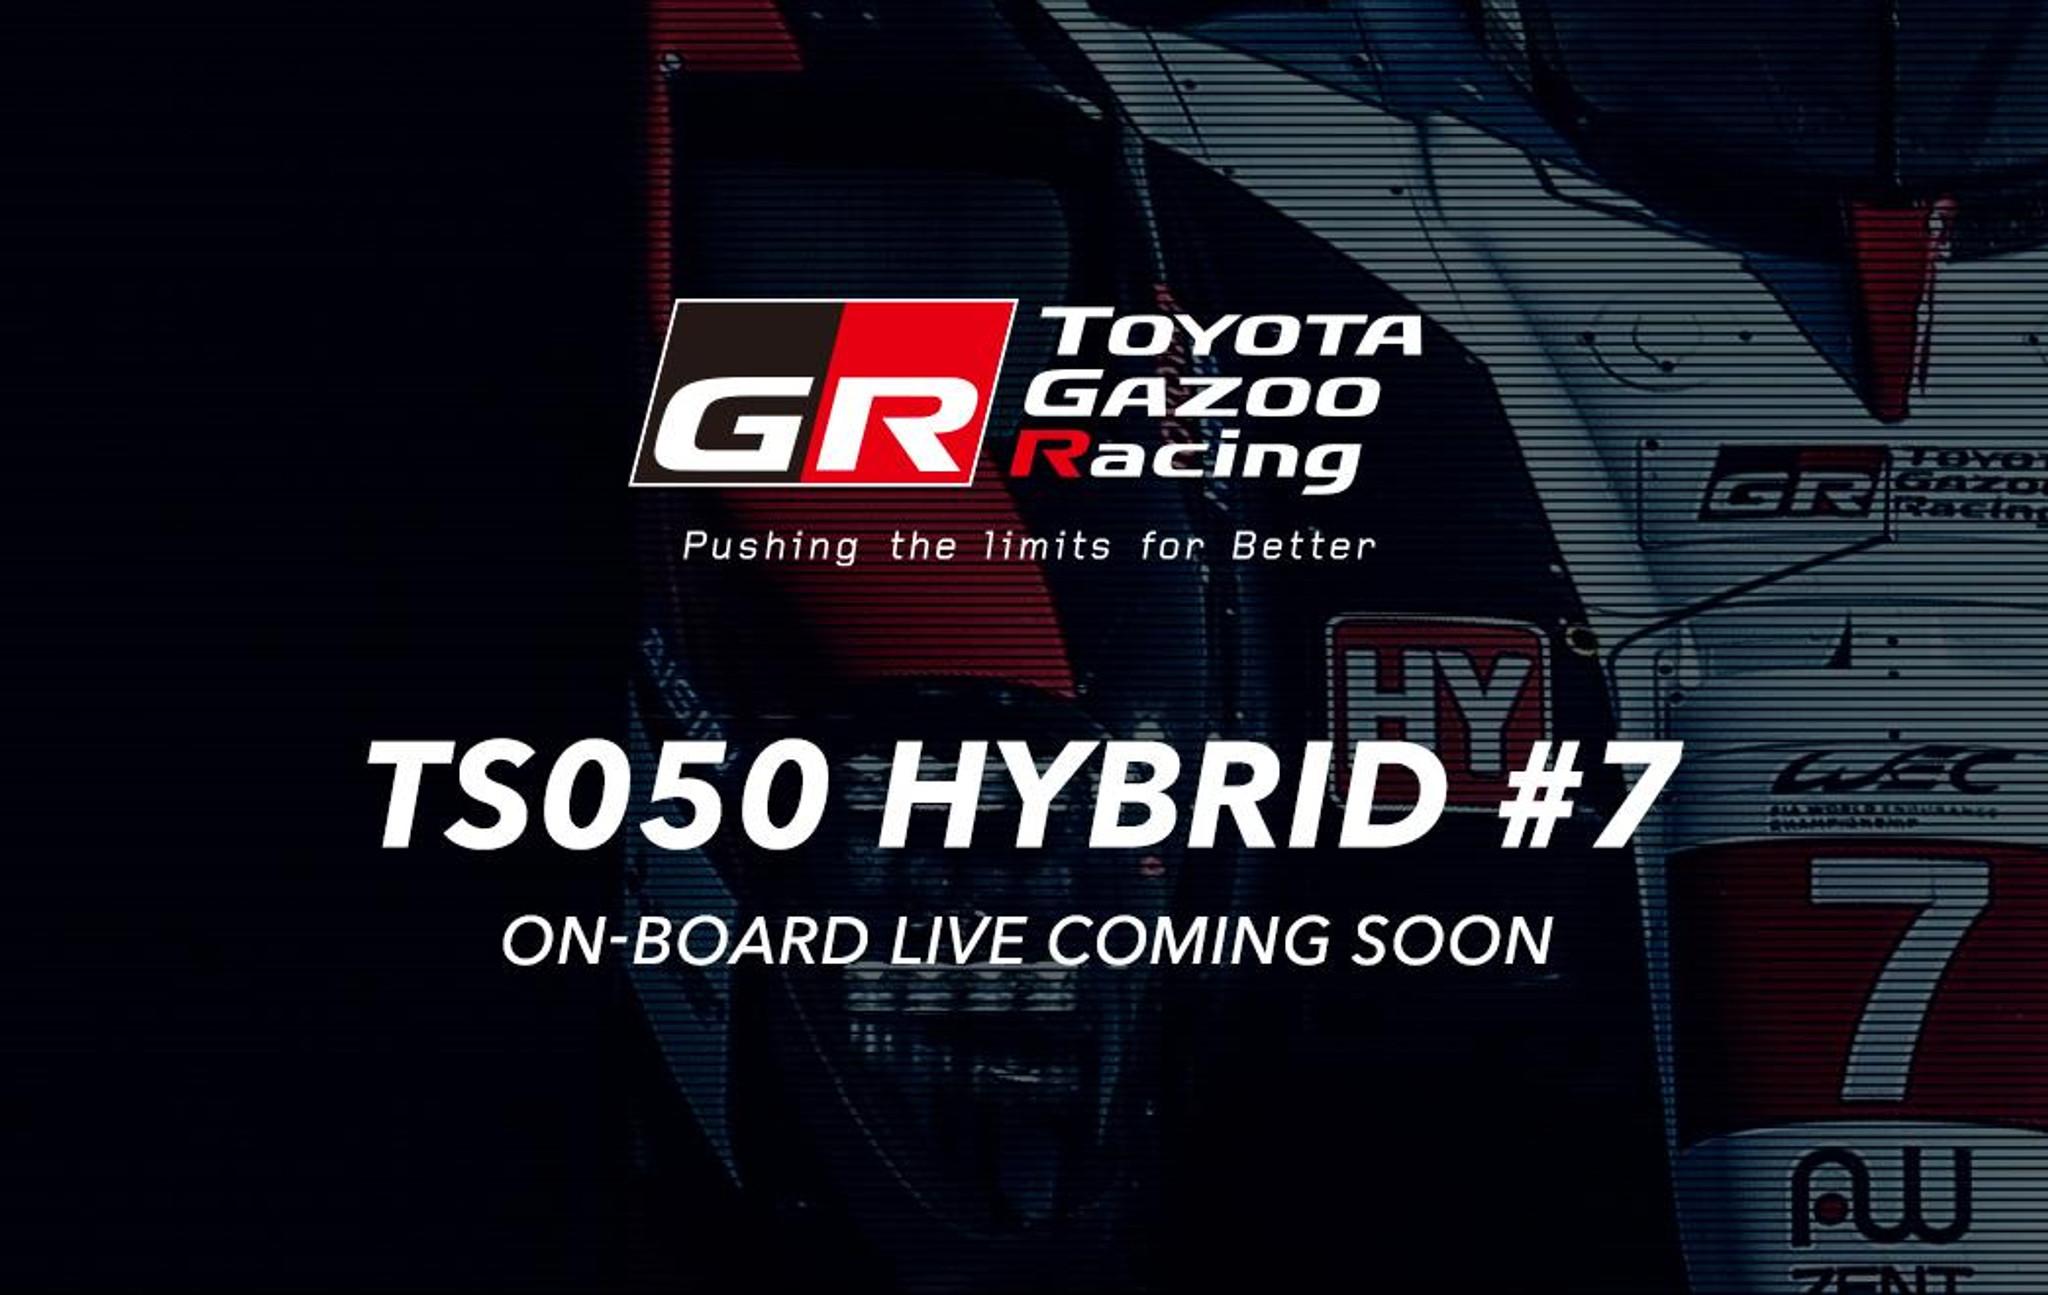 LIVE onboard with Toyota Gazoo Racing | Phil Gilbert Toyota